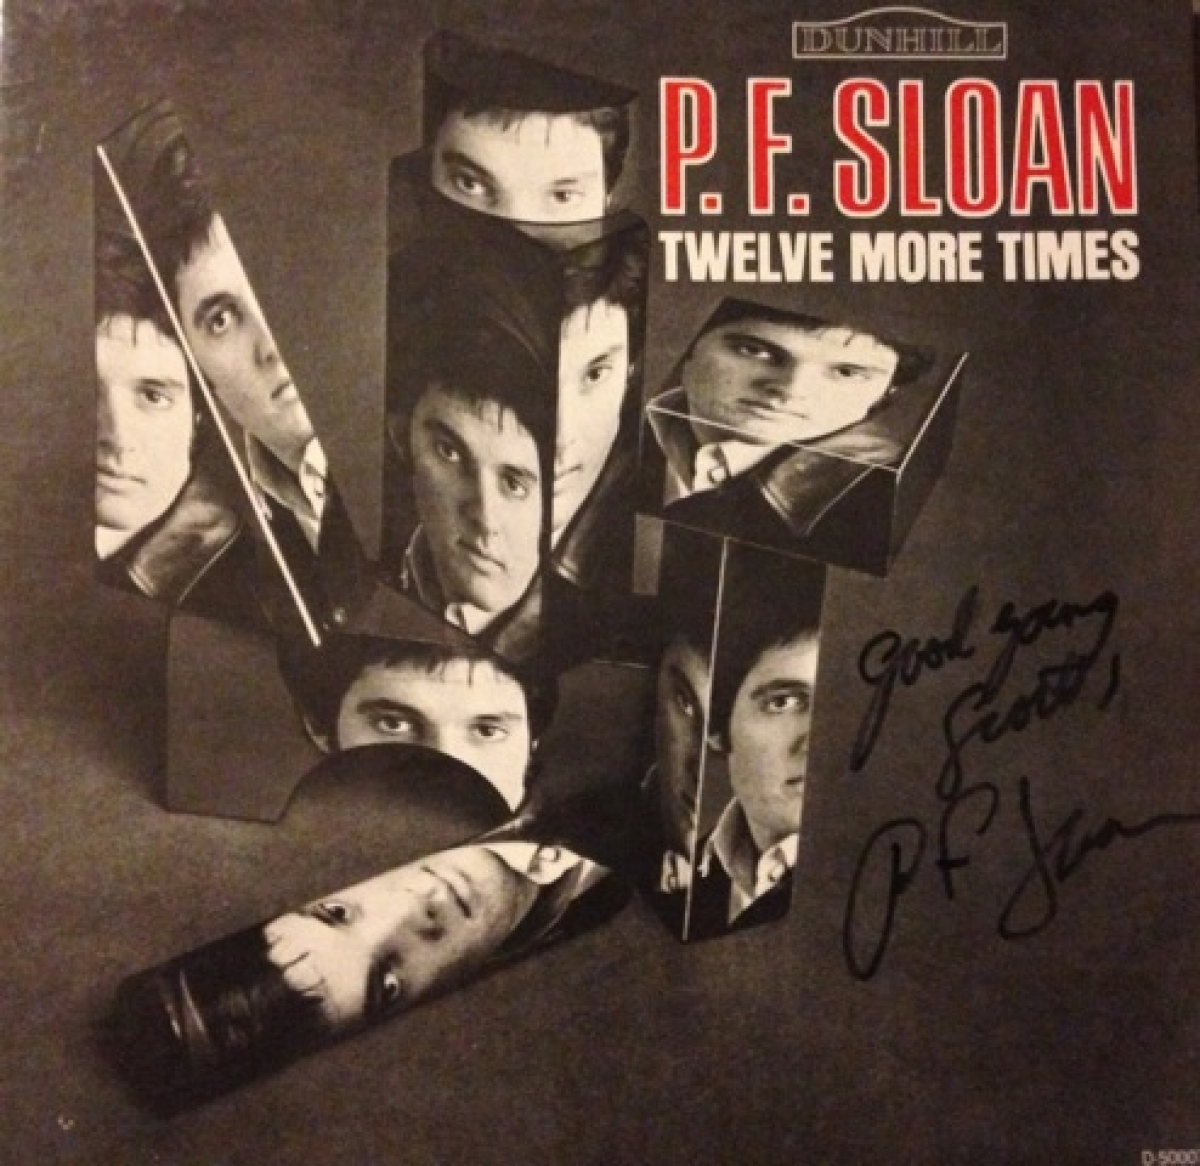 Last Time I Saw P. F. Sloan